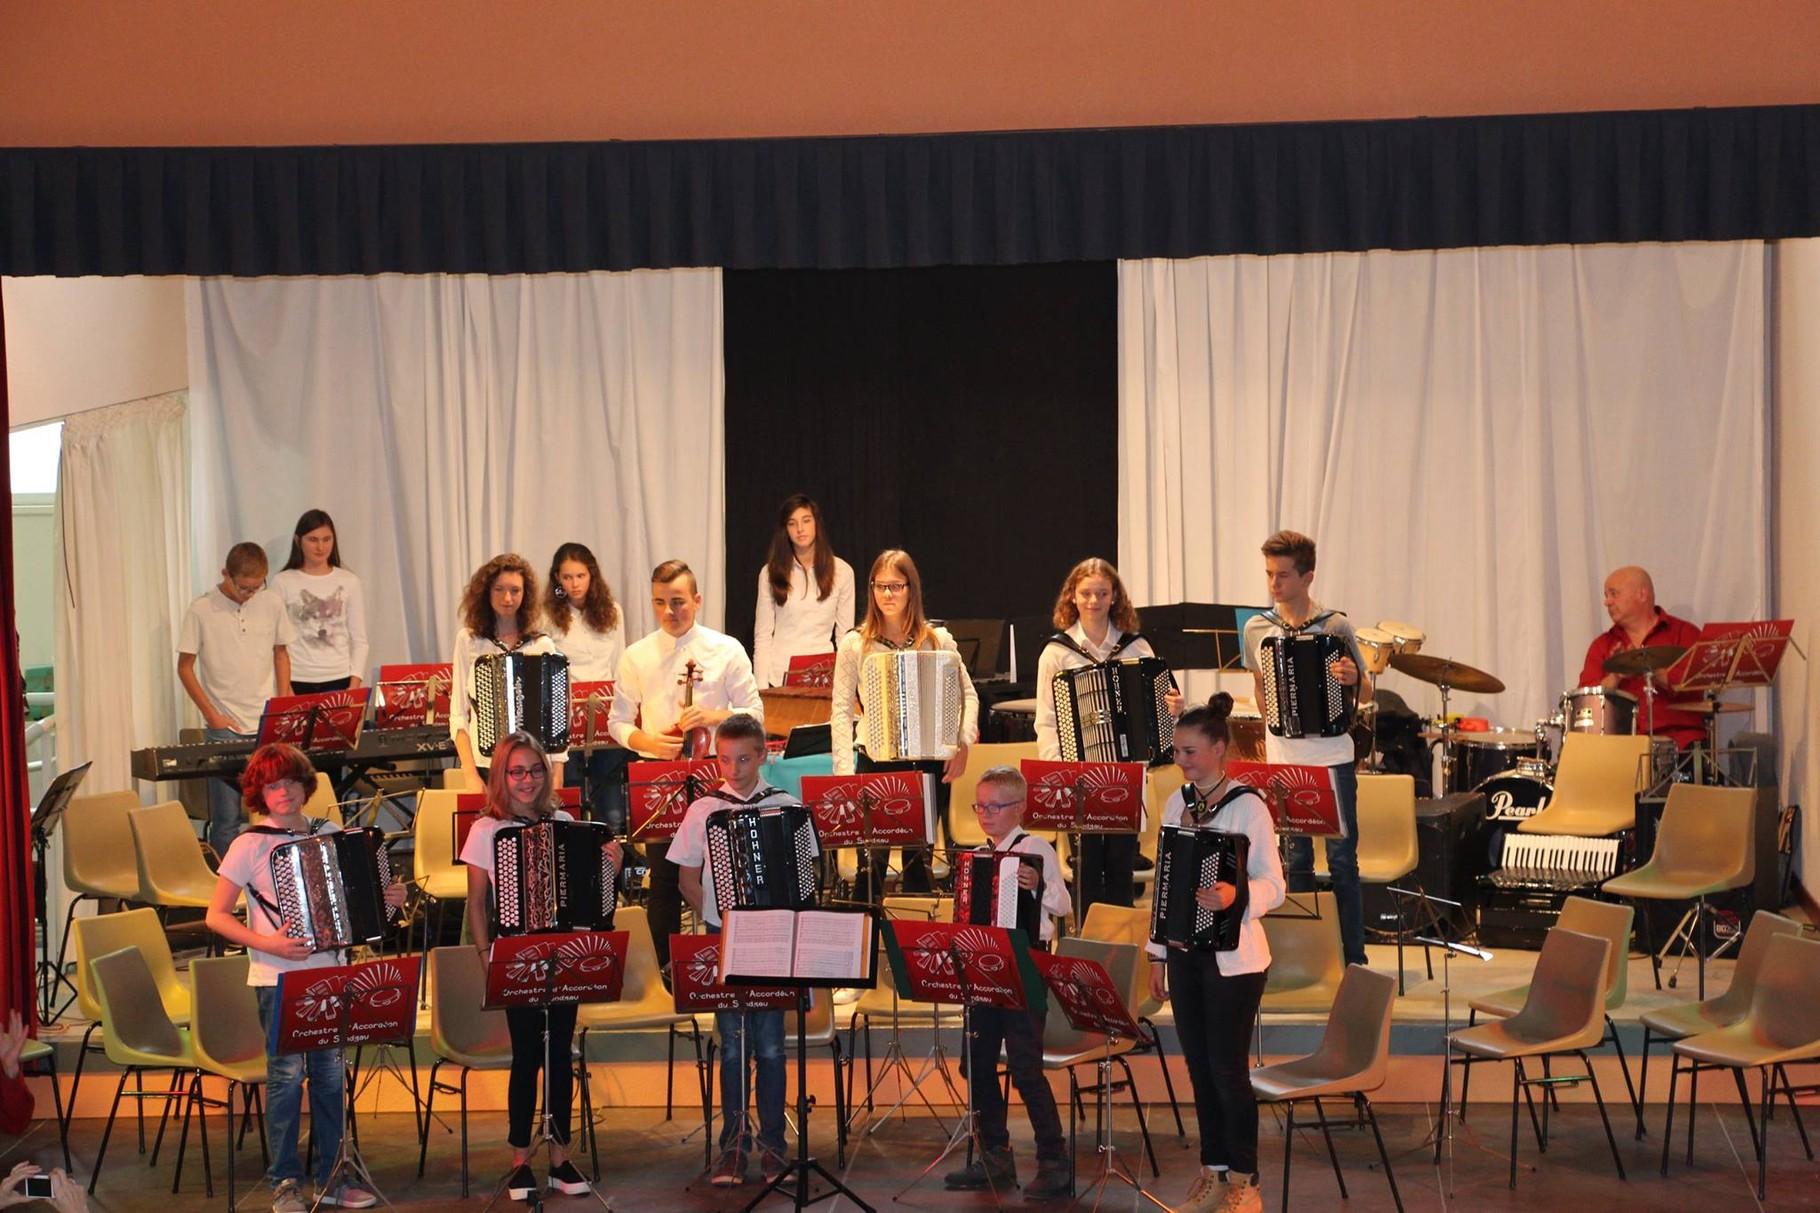 Concert Franco-Hollandais - Roppentwiller 18.10.15 - Photo F. Zimmermann